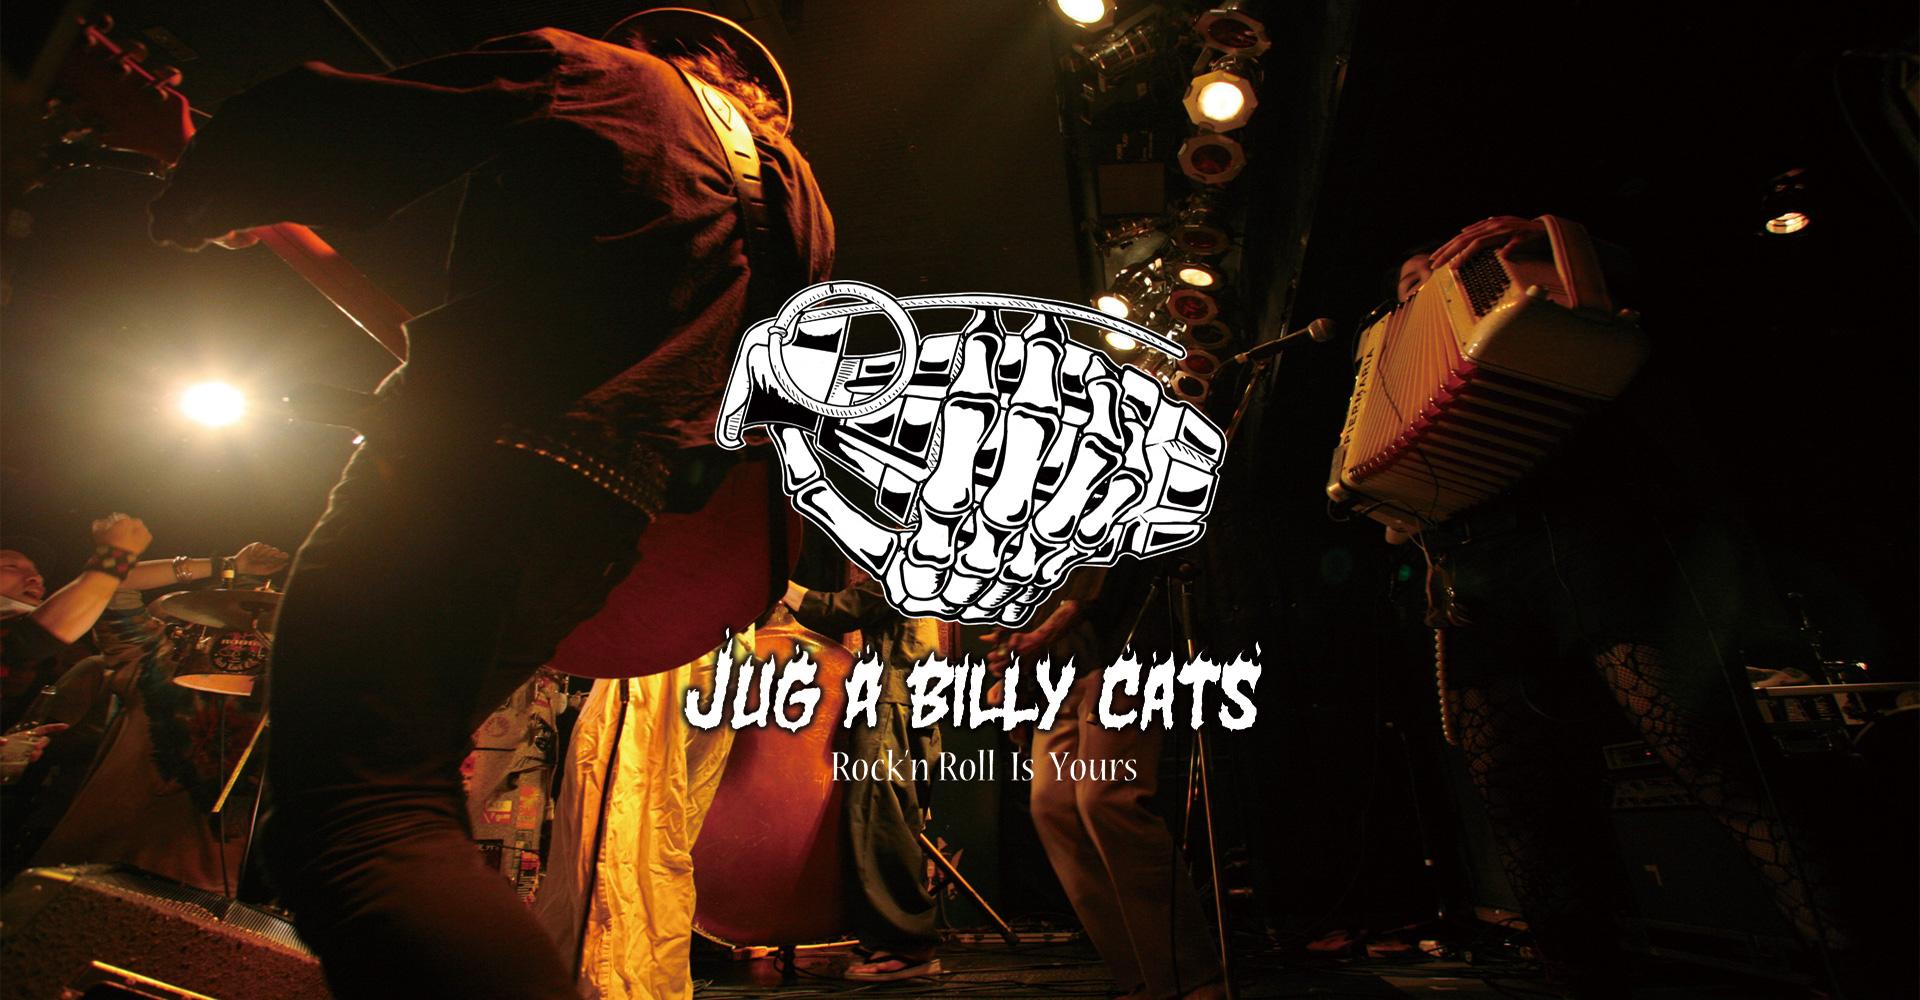 JUG A BILLY CATS/ジャガビリーキャッツ